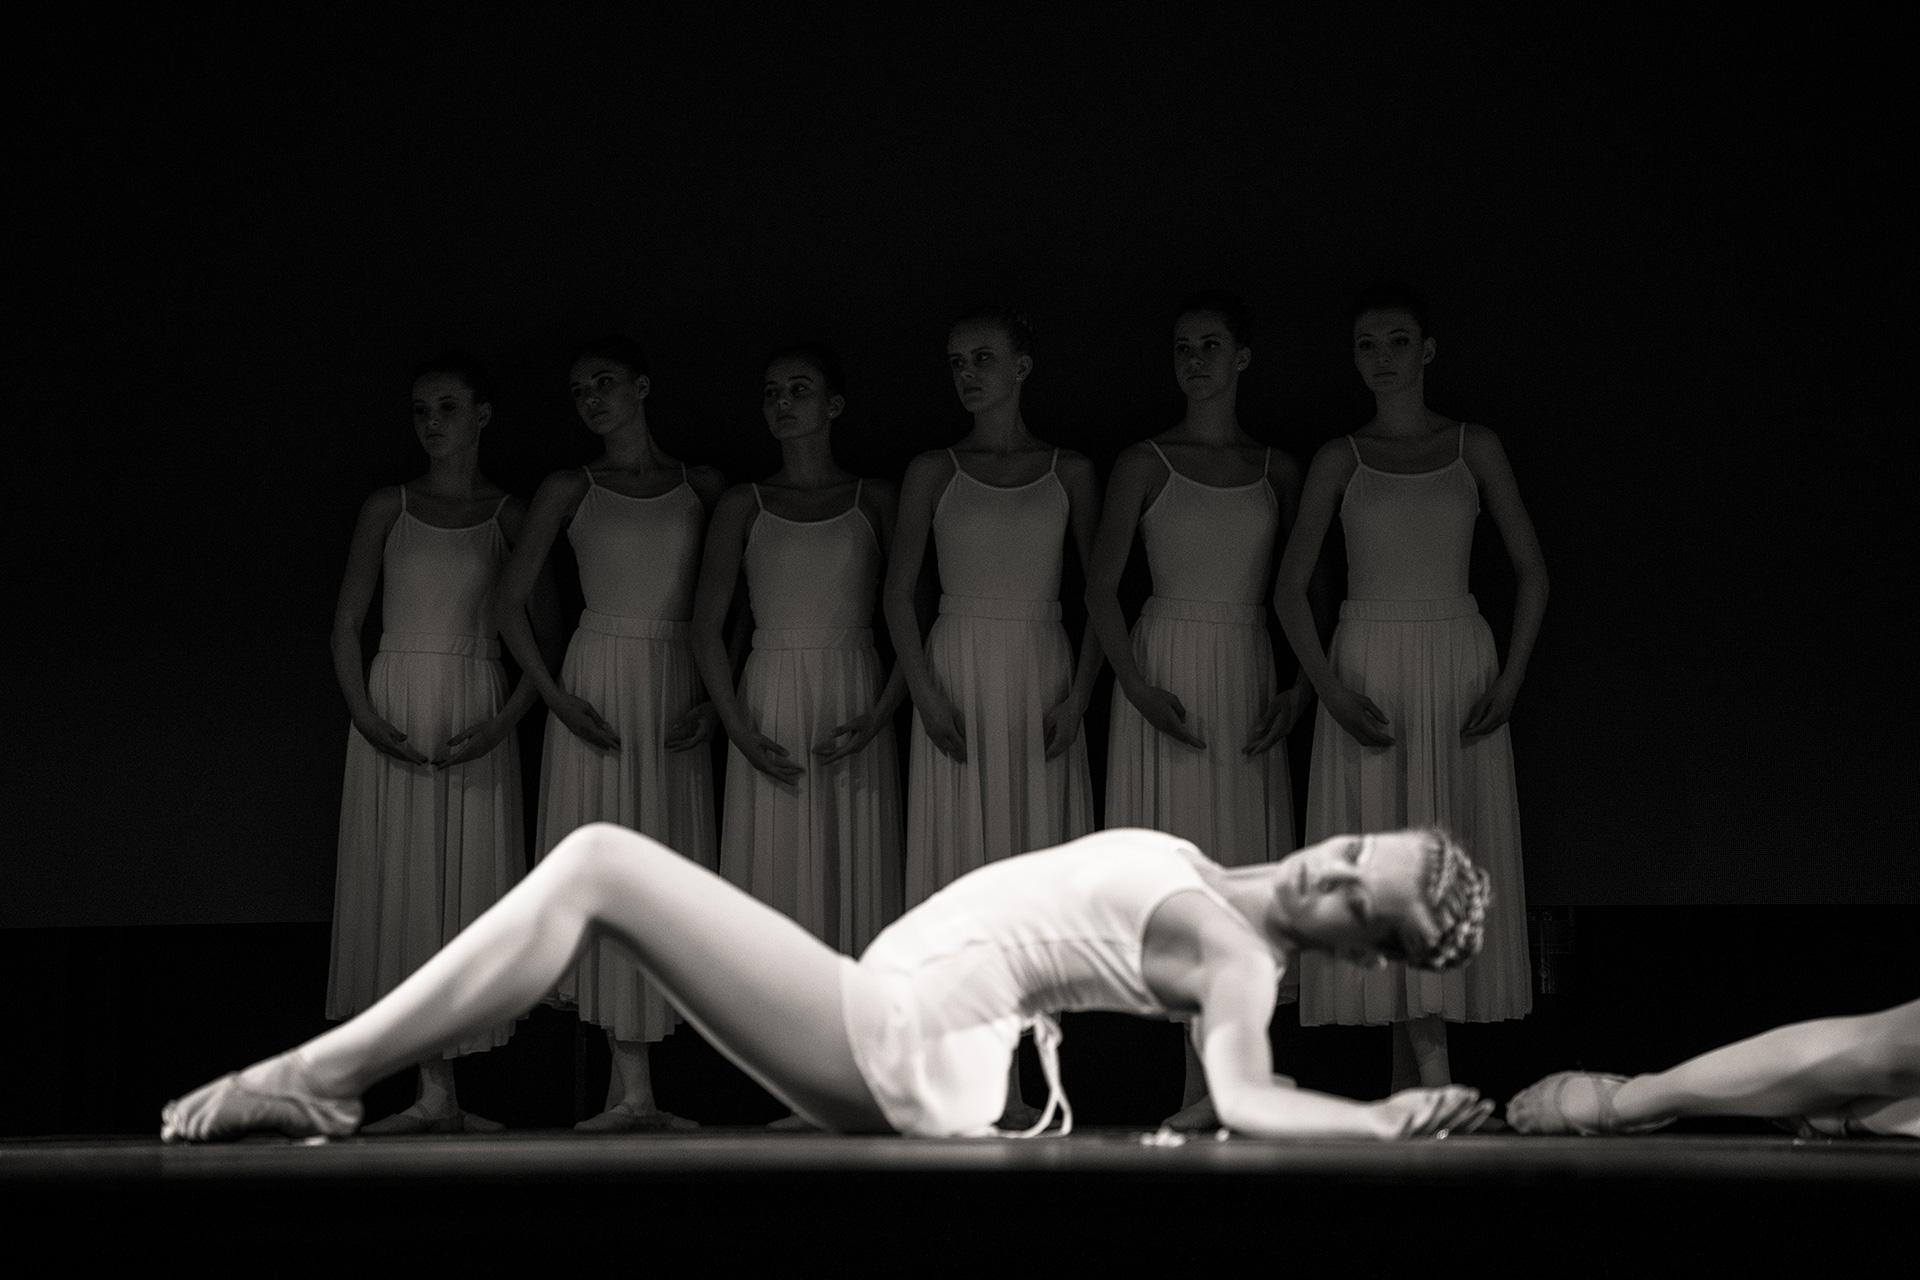 Ballett-by-SilvanGiger-61.jpg